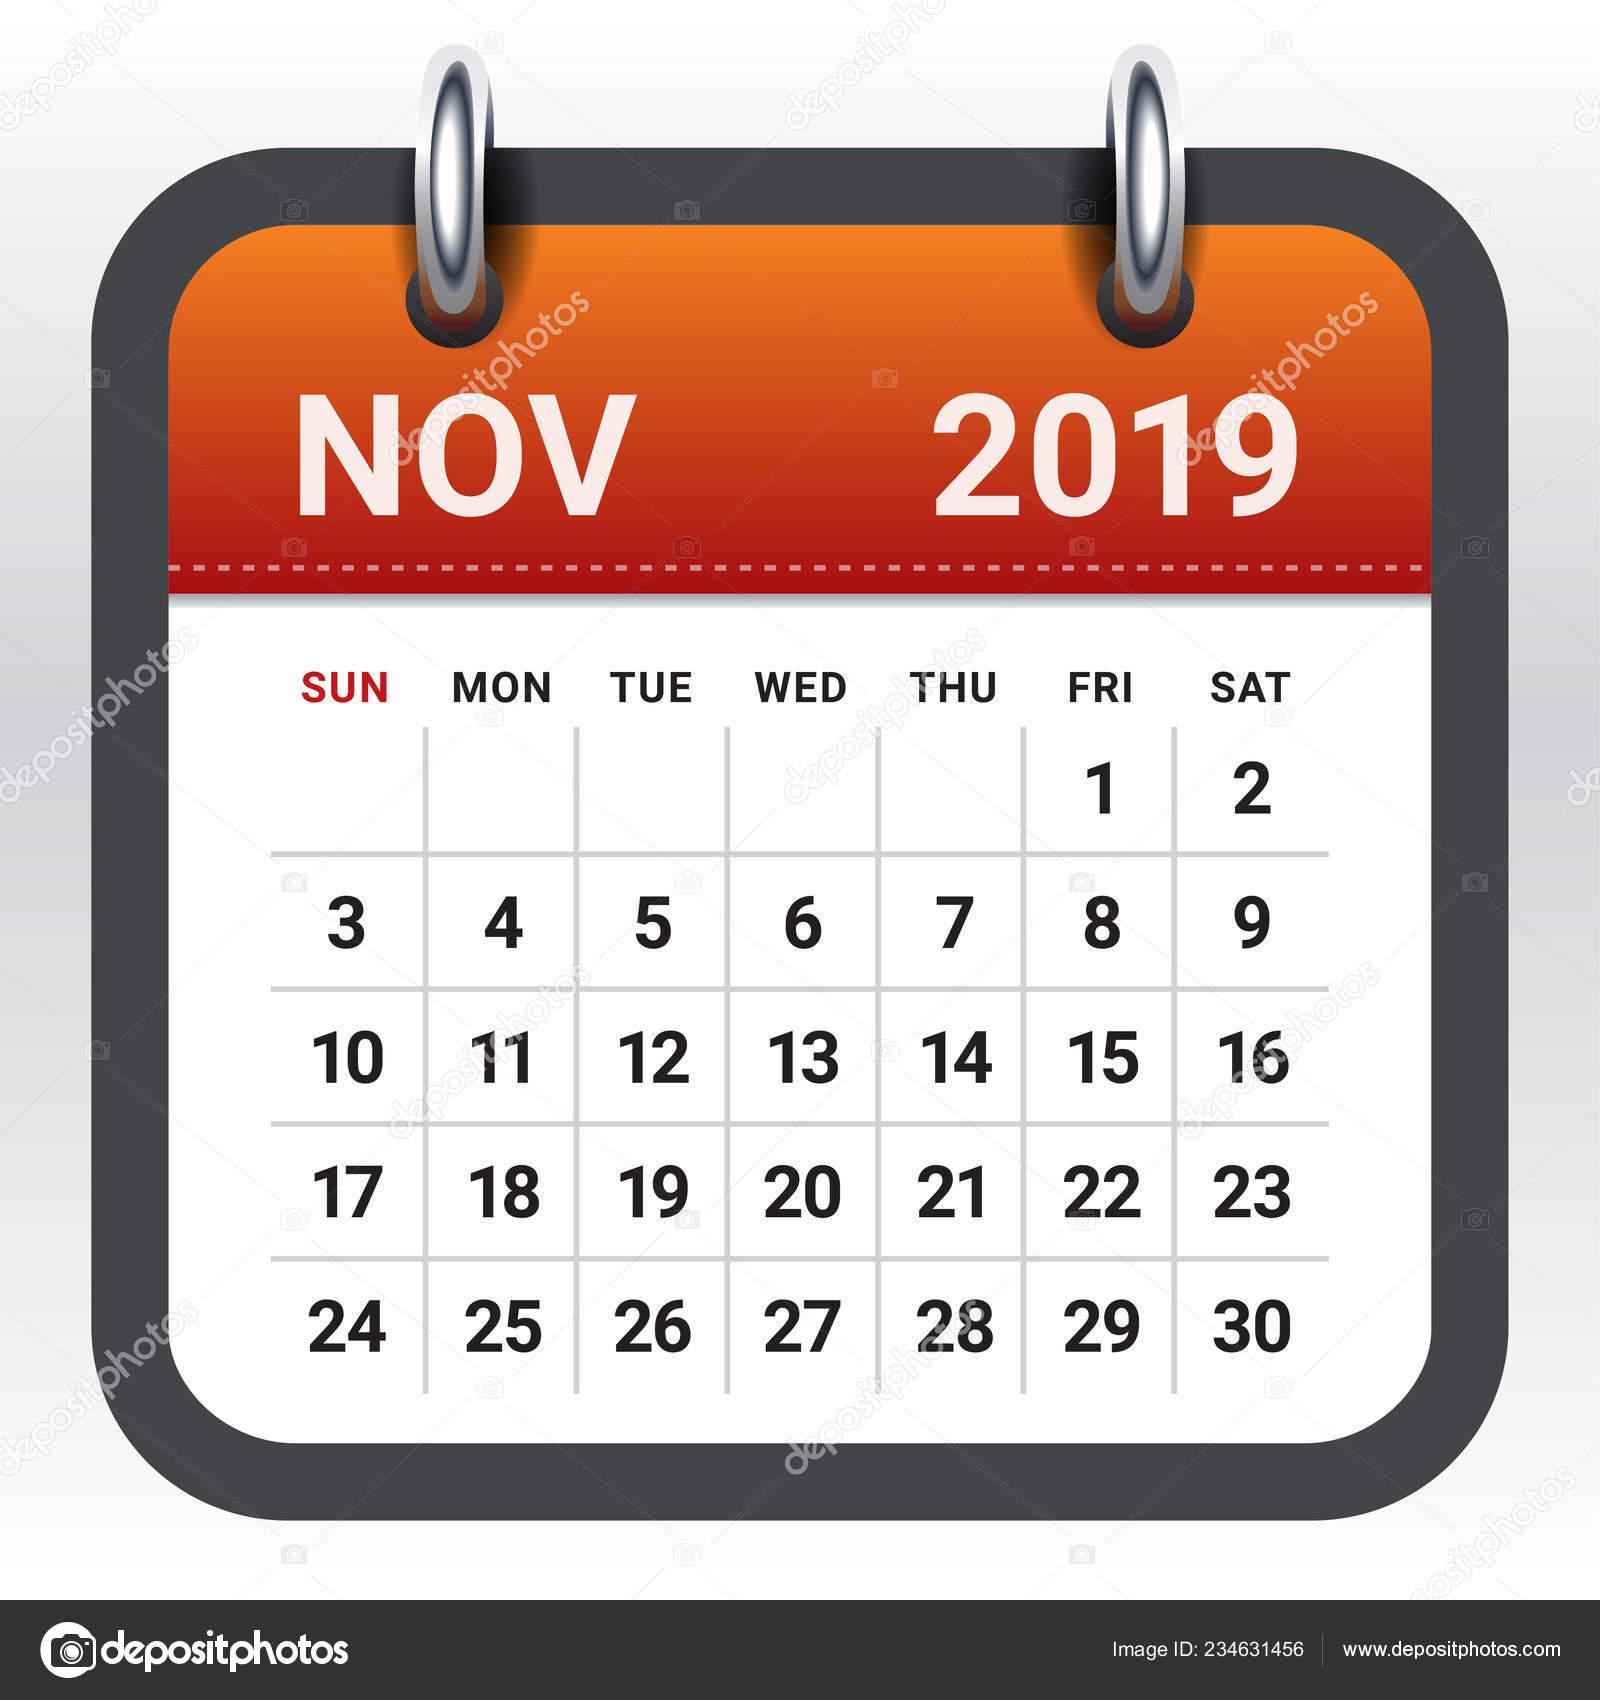 Illustration Calendrier.November 2019 Monthly Calendar Vector Illustration Simple